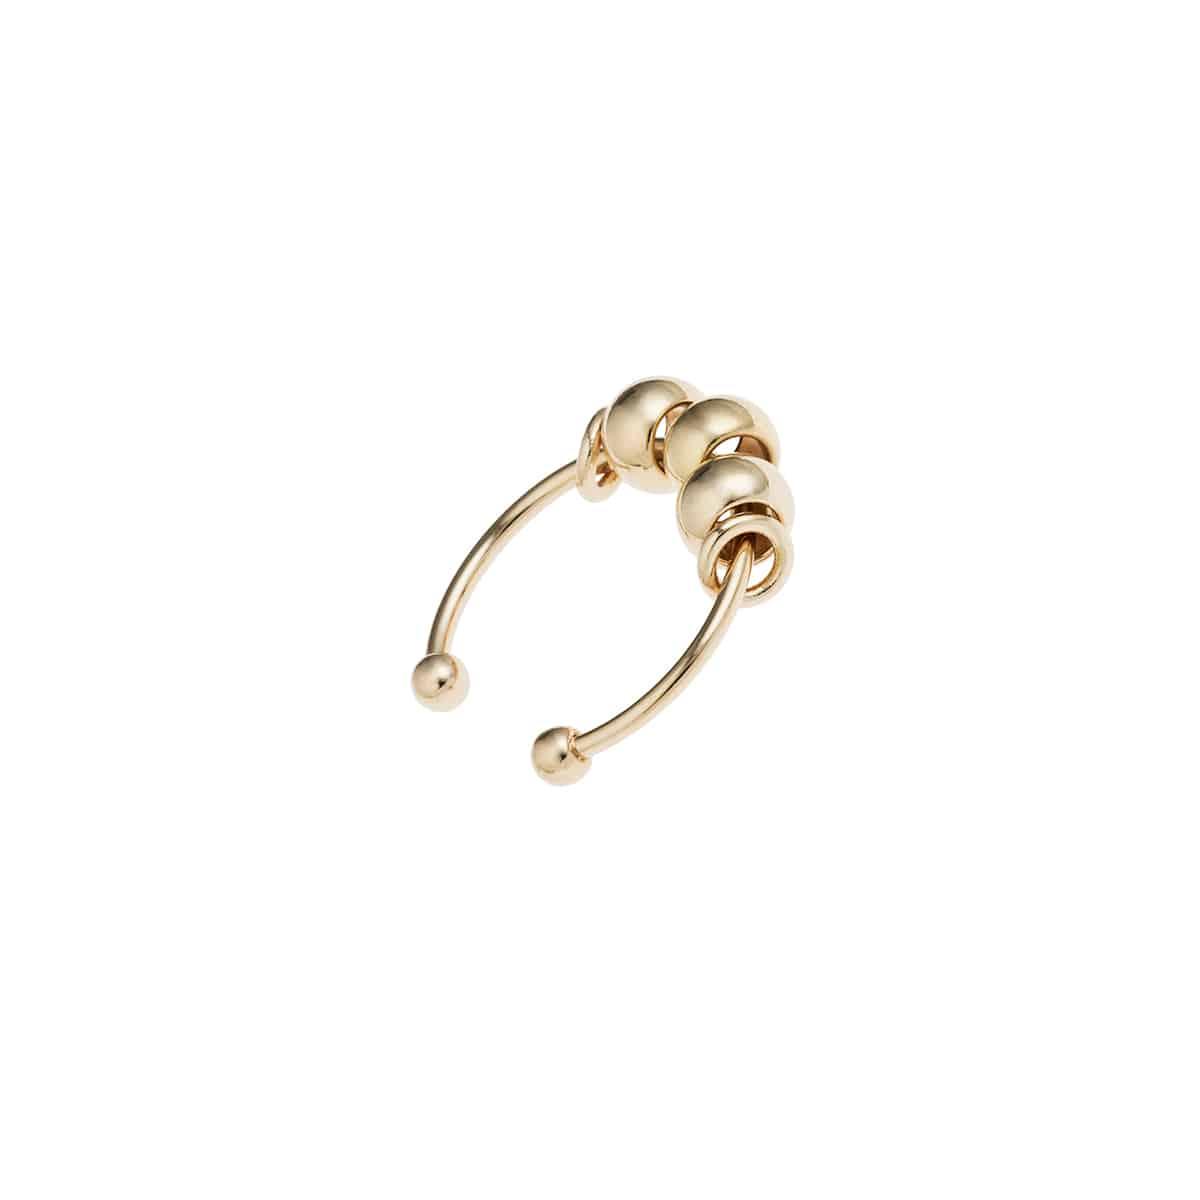 pink gold ring coralie de seynes l'erudite concept store handmade jewellery woman fashion